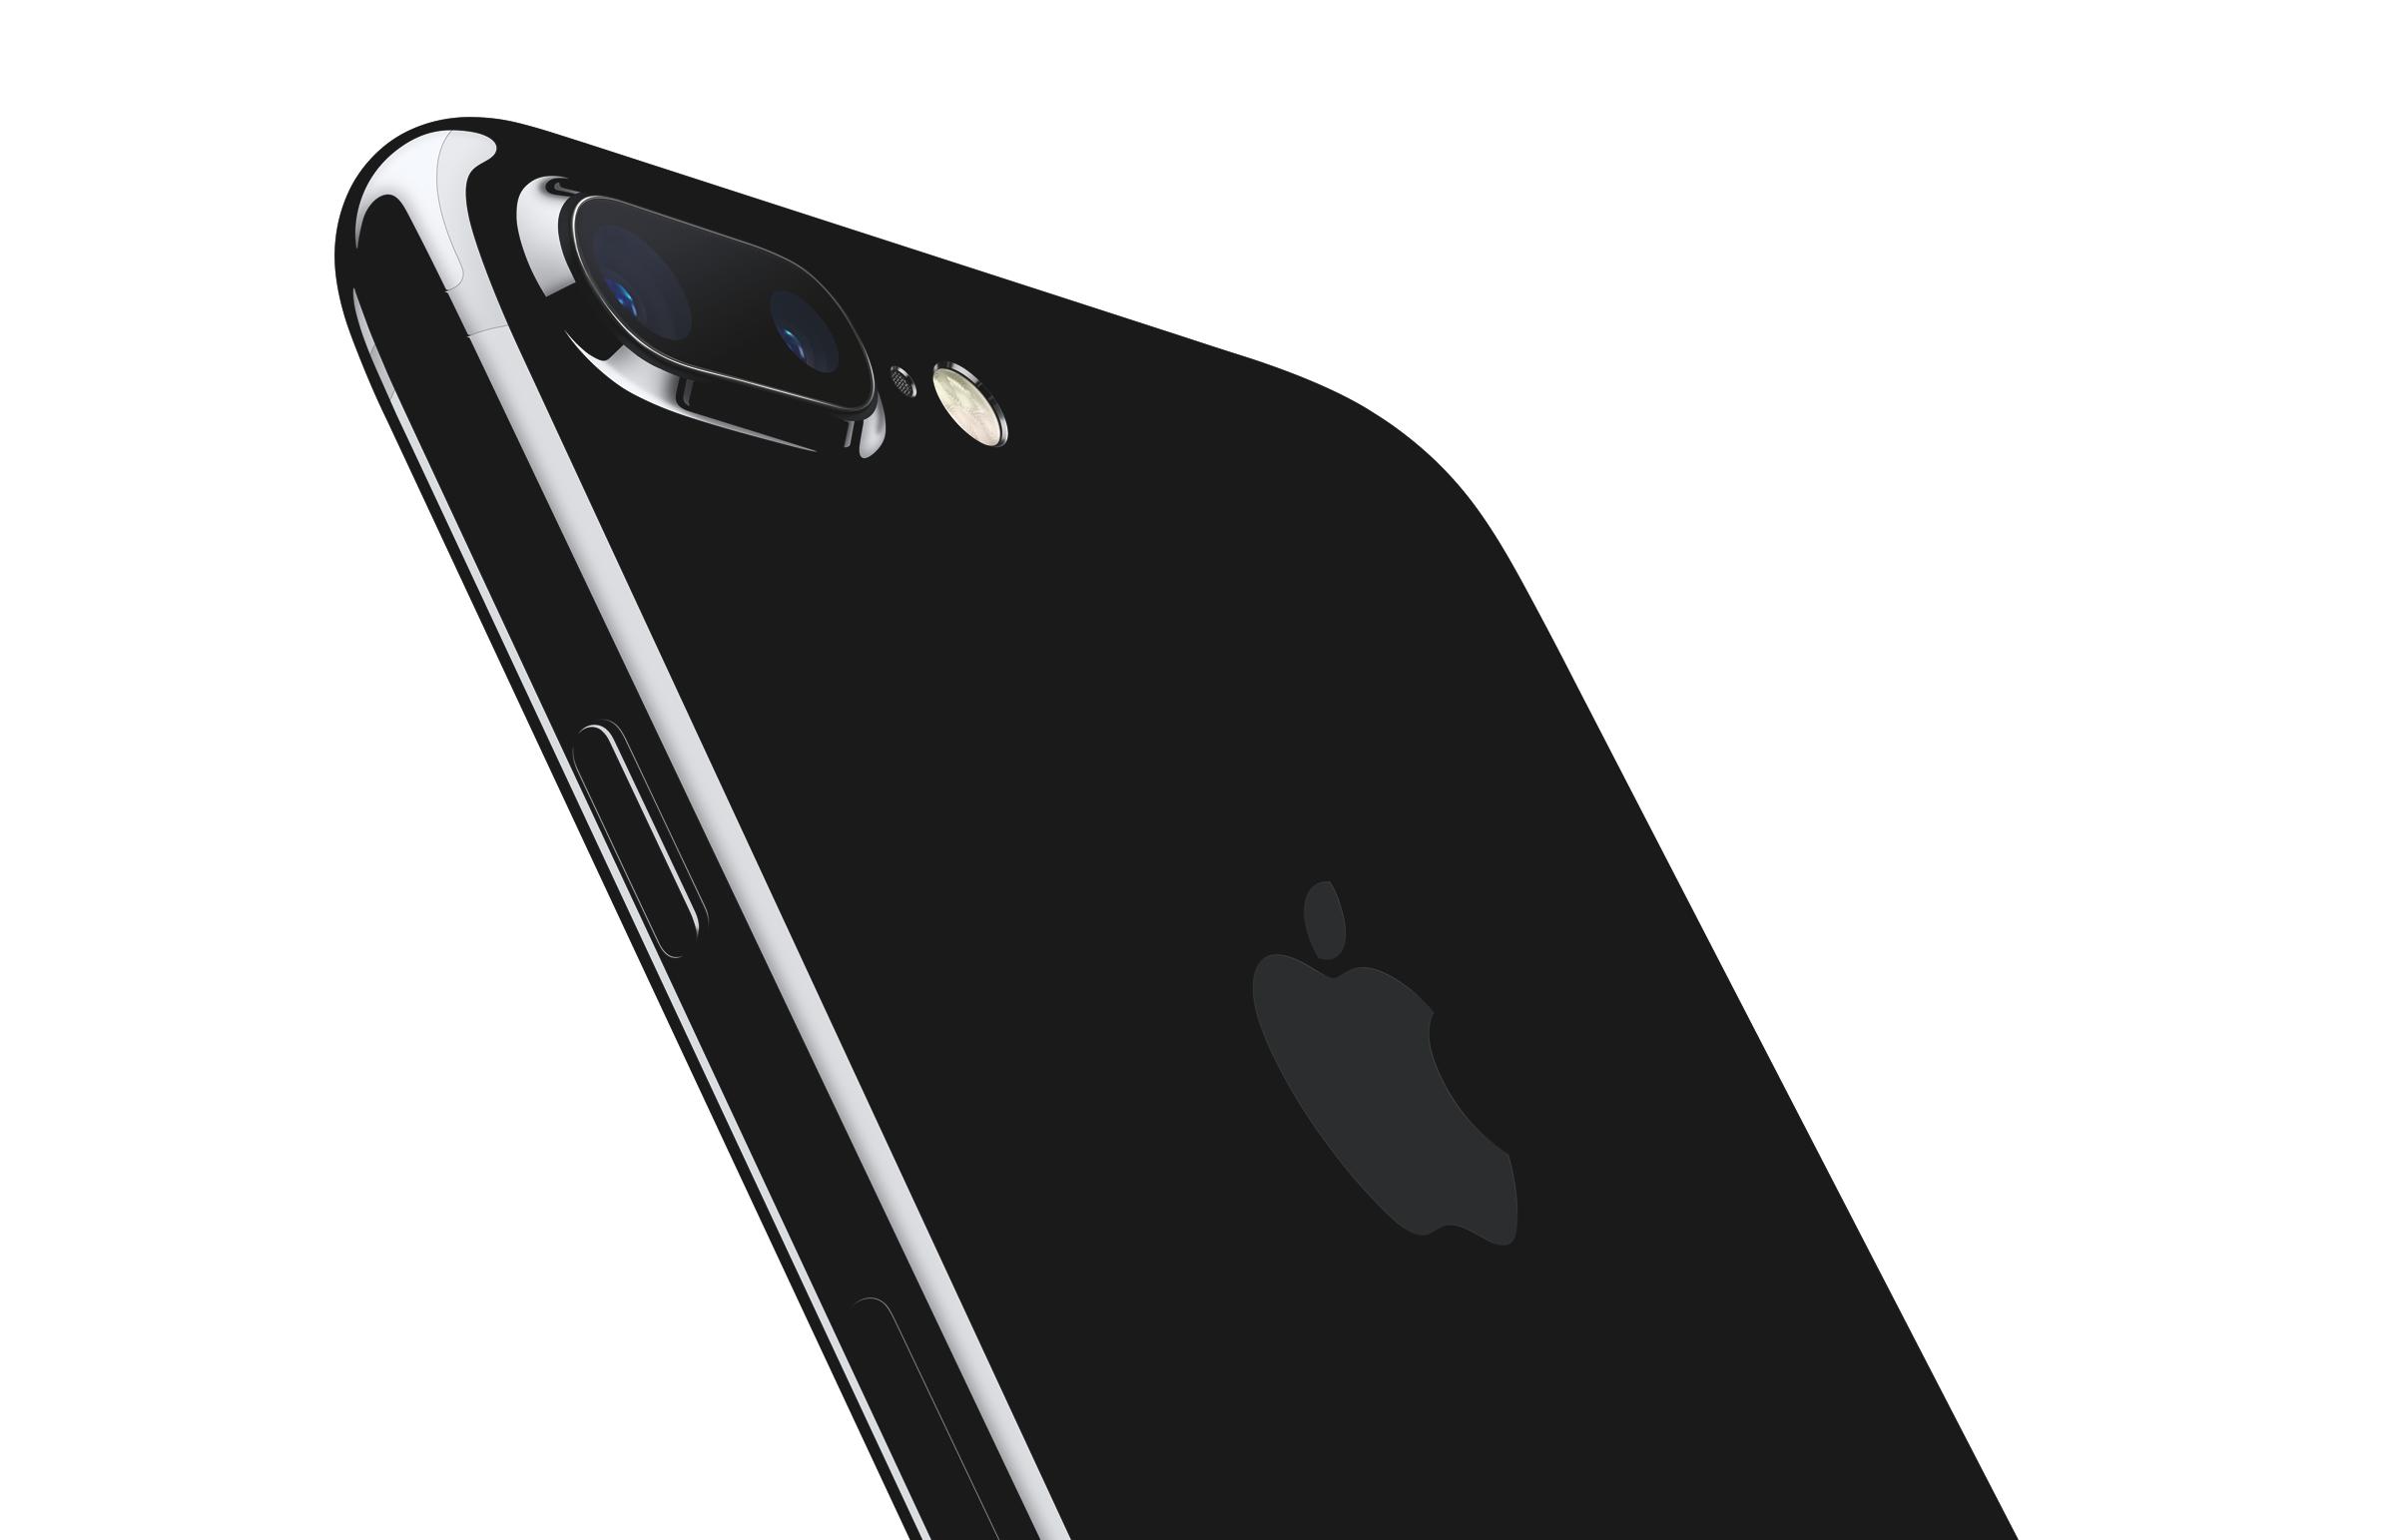 iPhone7Plus JetBlk 34BR LeanForward_PR PRINT